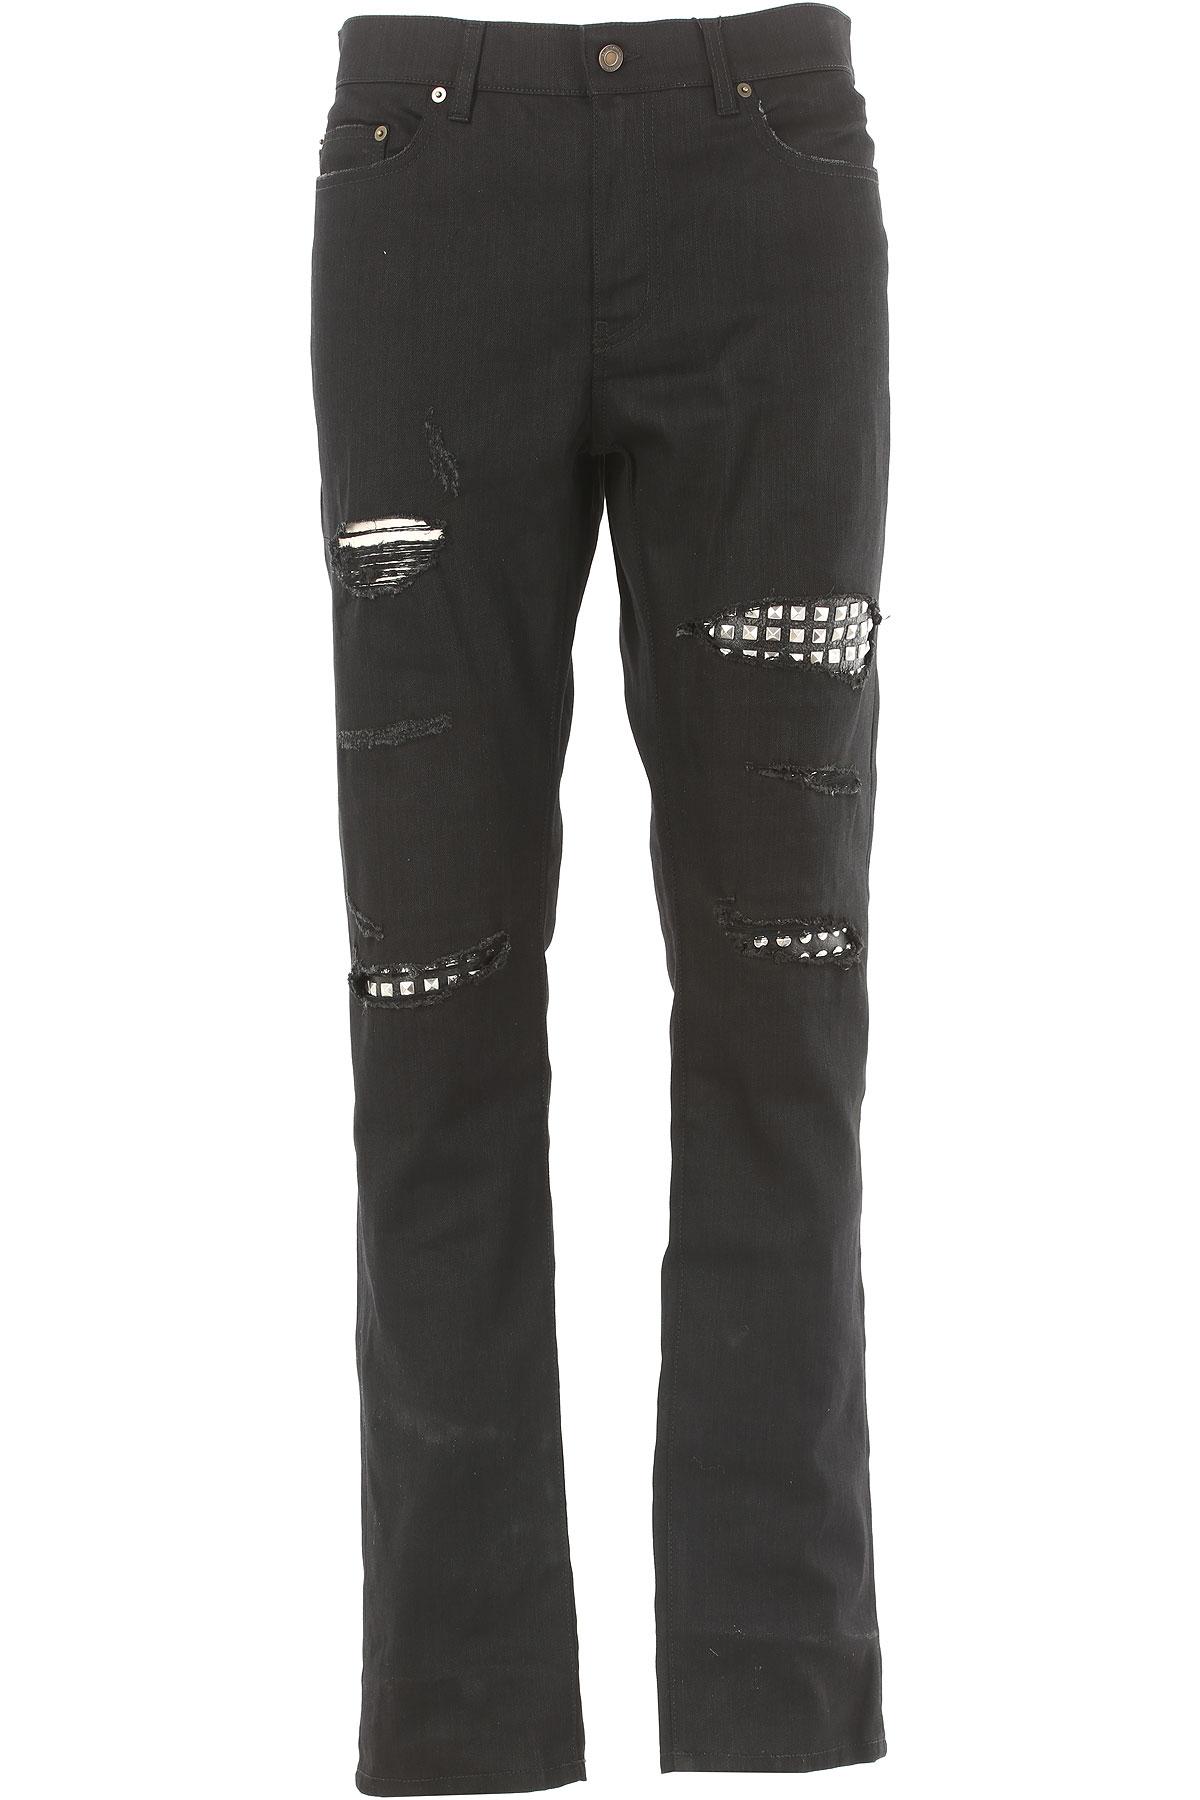 Yves Saint Laurent Jeans On Sale in Outlet, Black, Cotton, 2017, 30 32 33 34